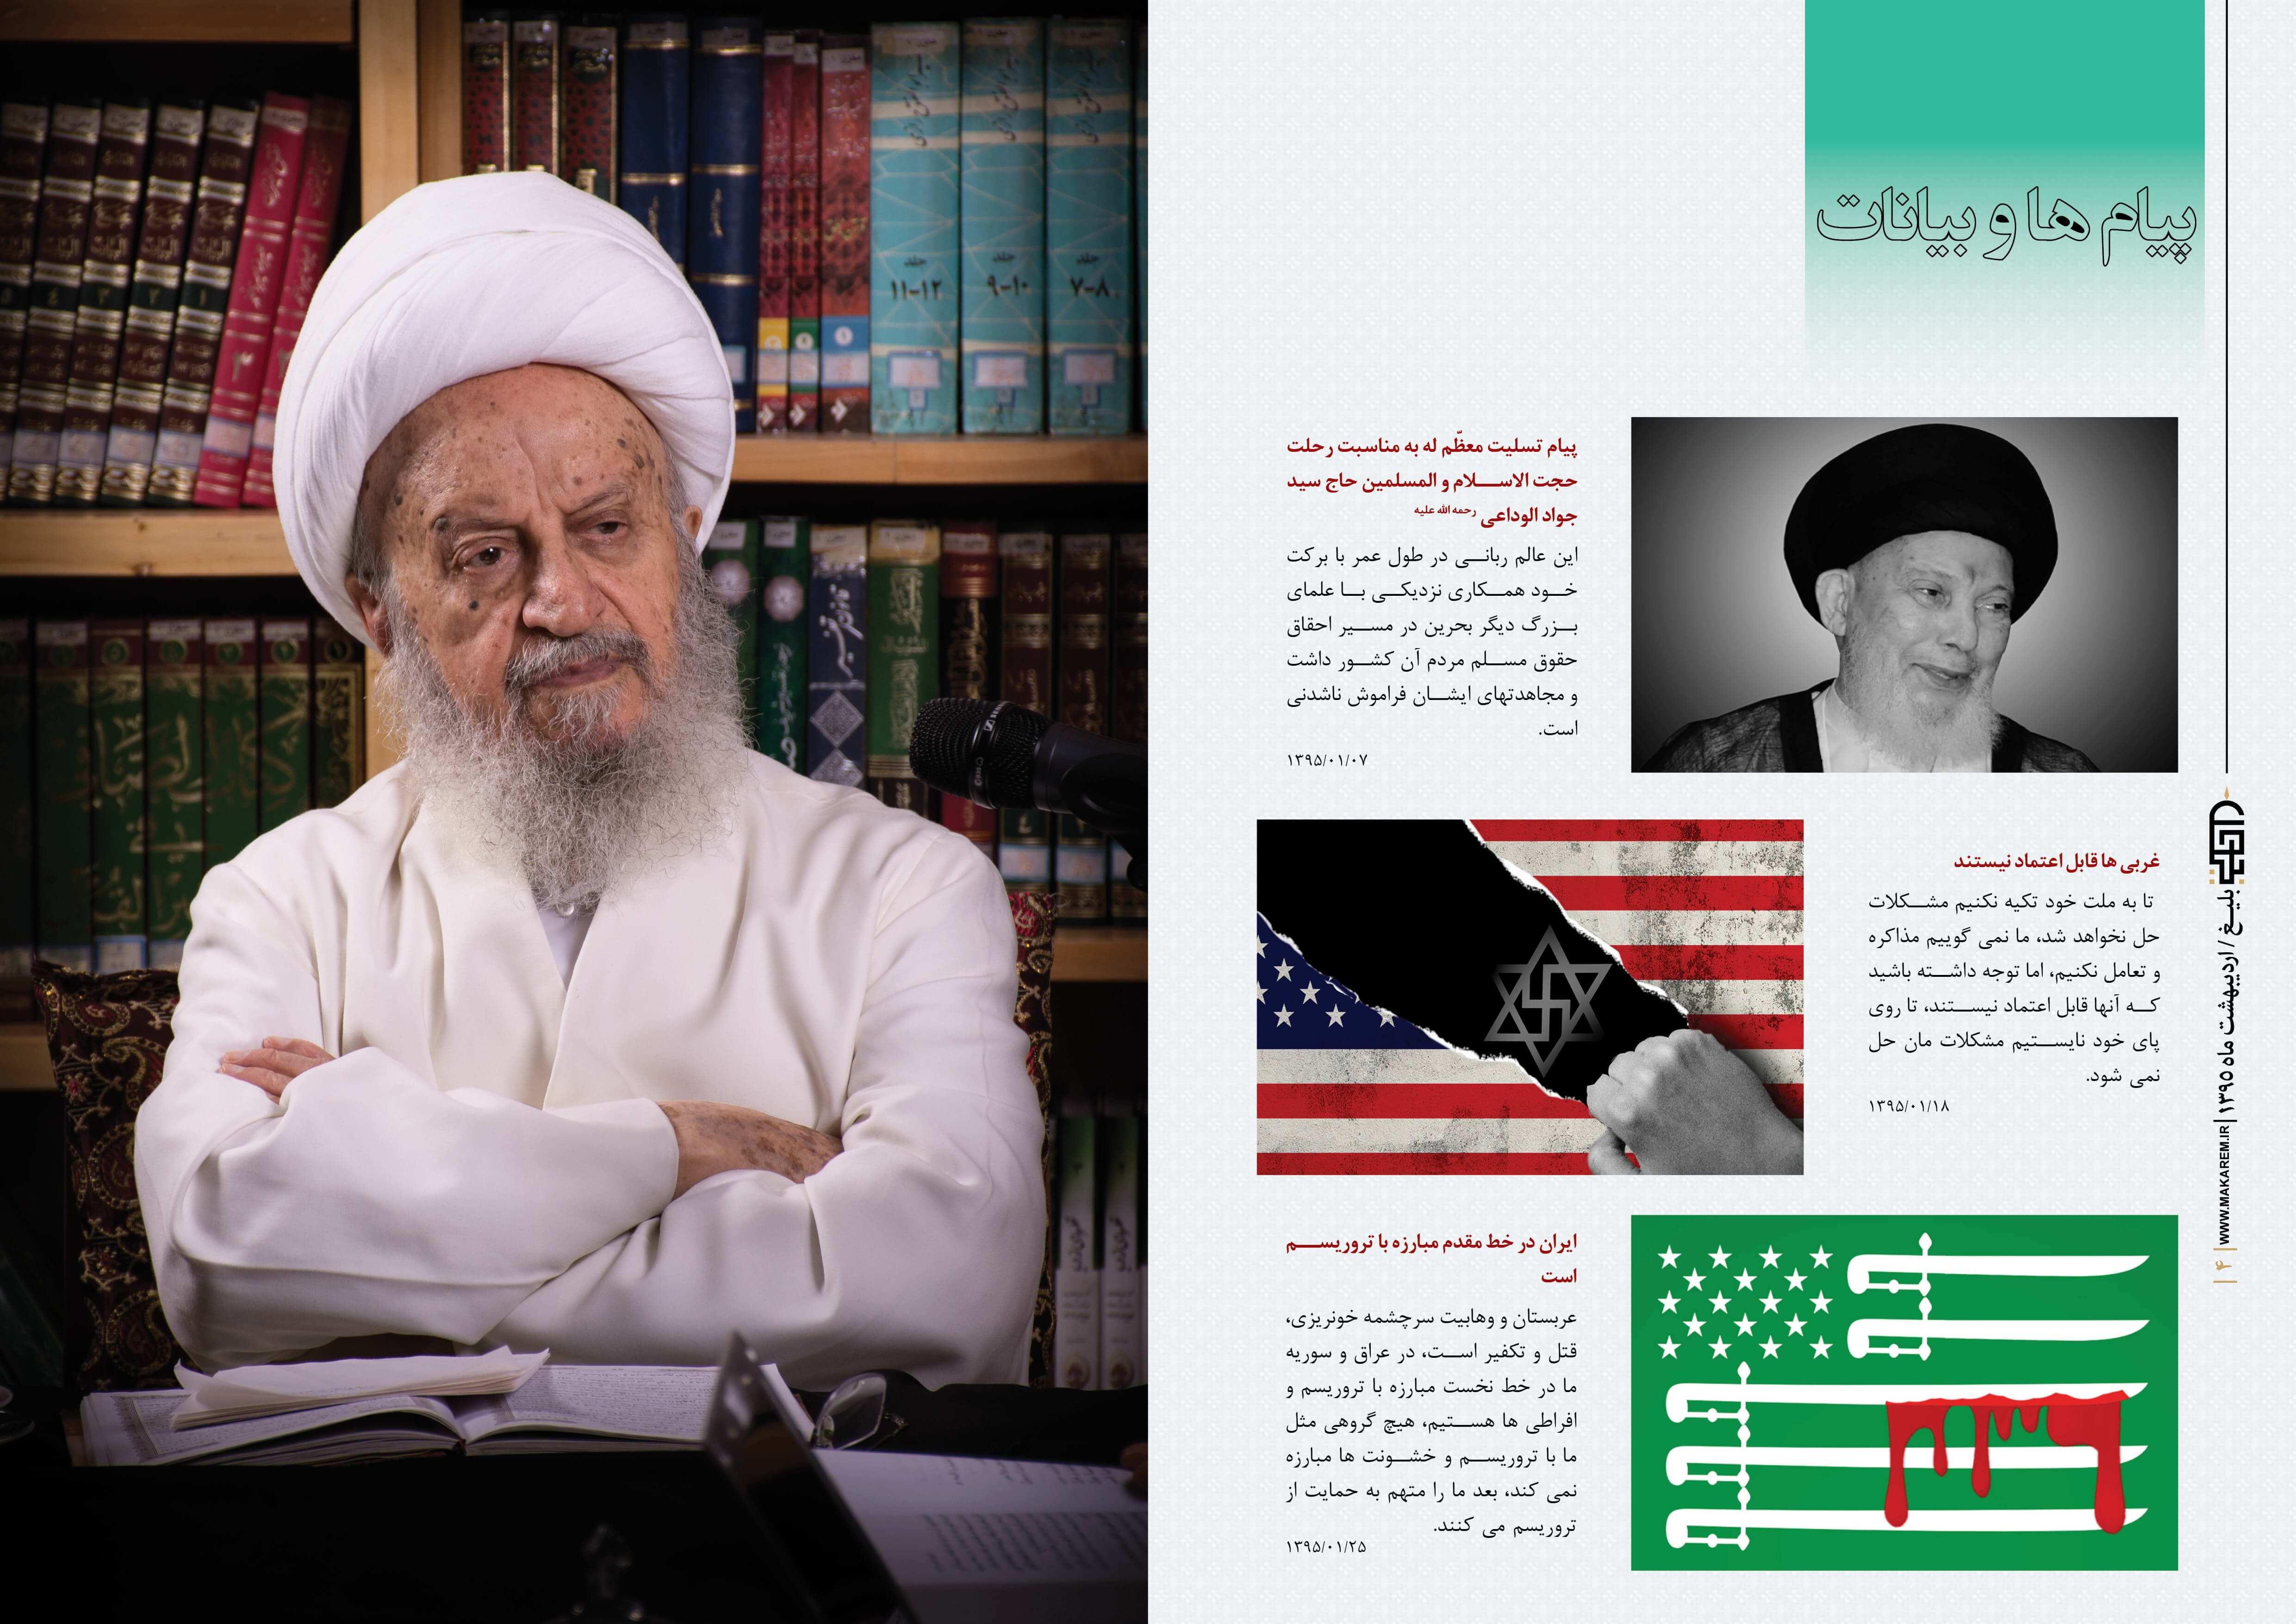 03-مدرسه الامام امیر المومنین (ع)